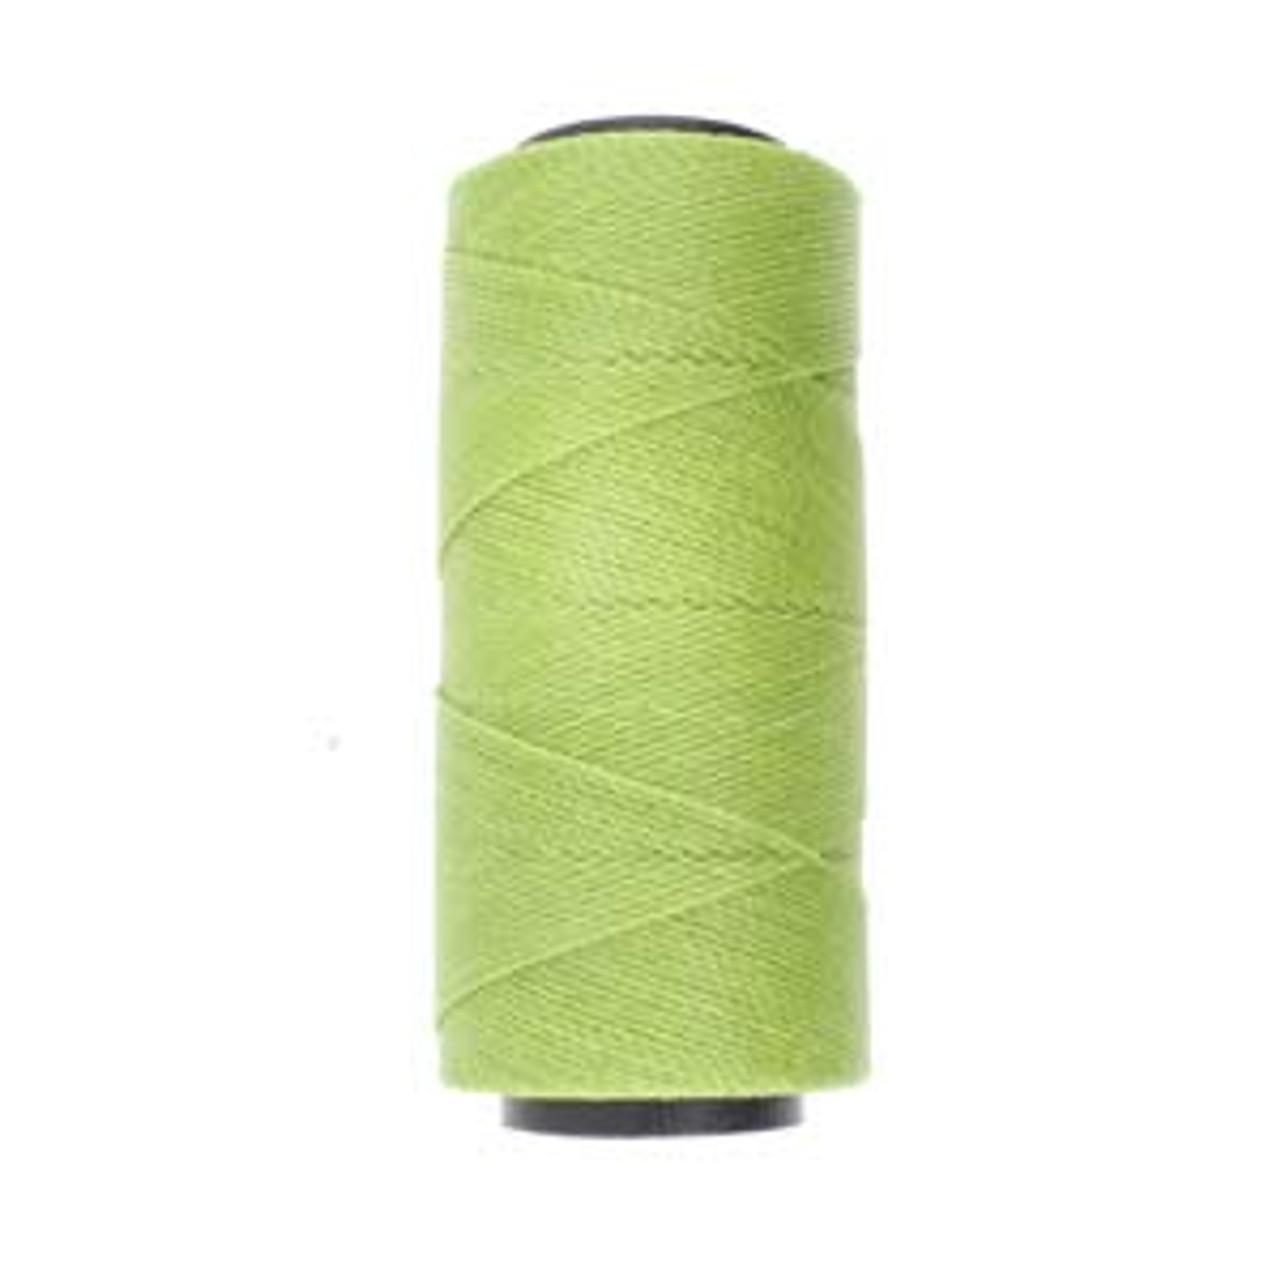 6yds 2 ply Lime Waxed Brazilian Cord